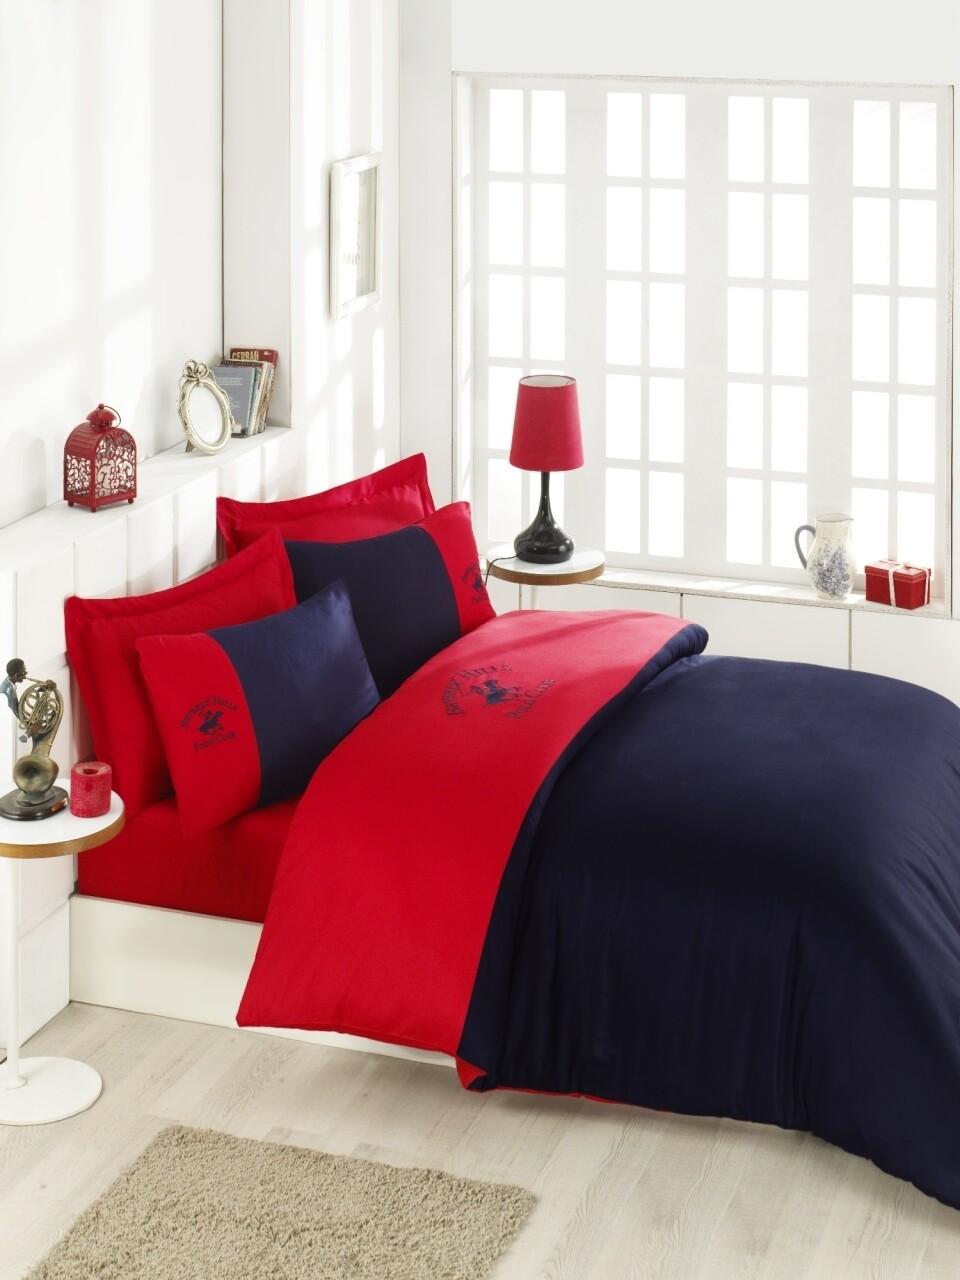 Lenjerie de pat dubla Red & Dark Blue, Beverly Hills Polo Club, 4 piese, 240 x 260 cm, 100% bumbac satinat, rosu/bleumarin